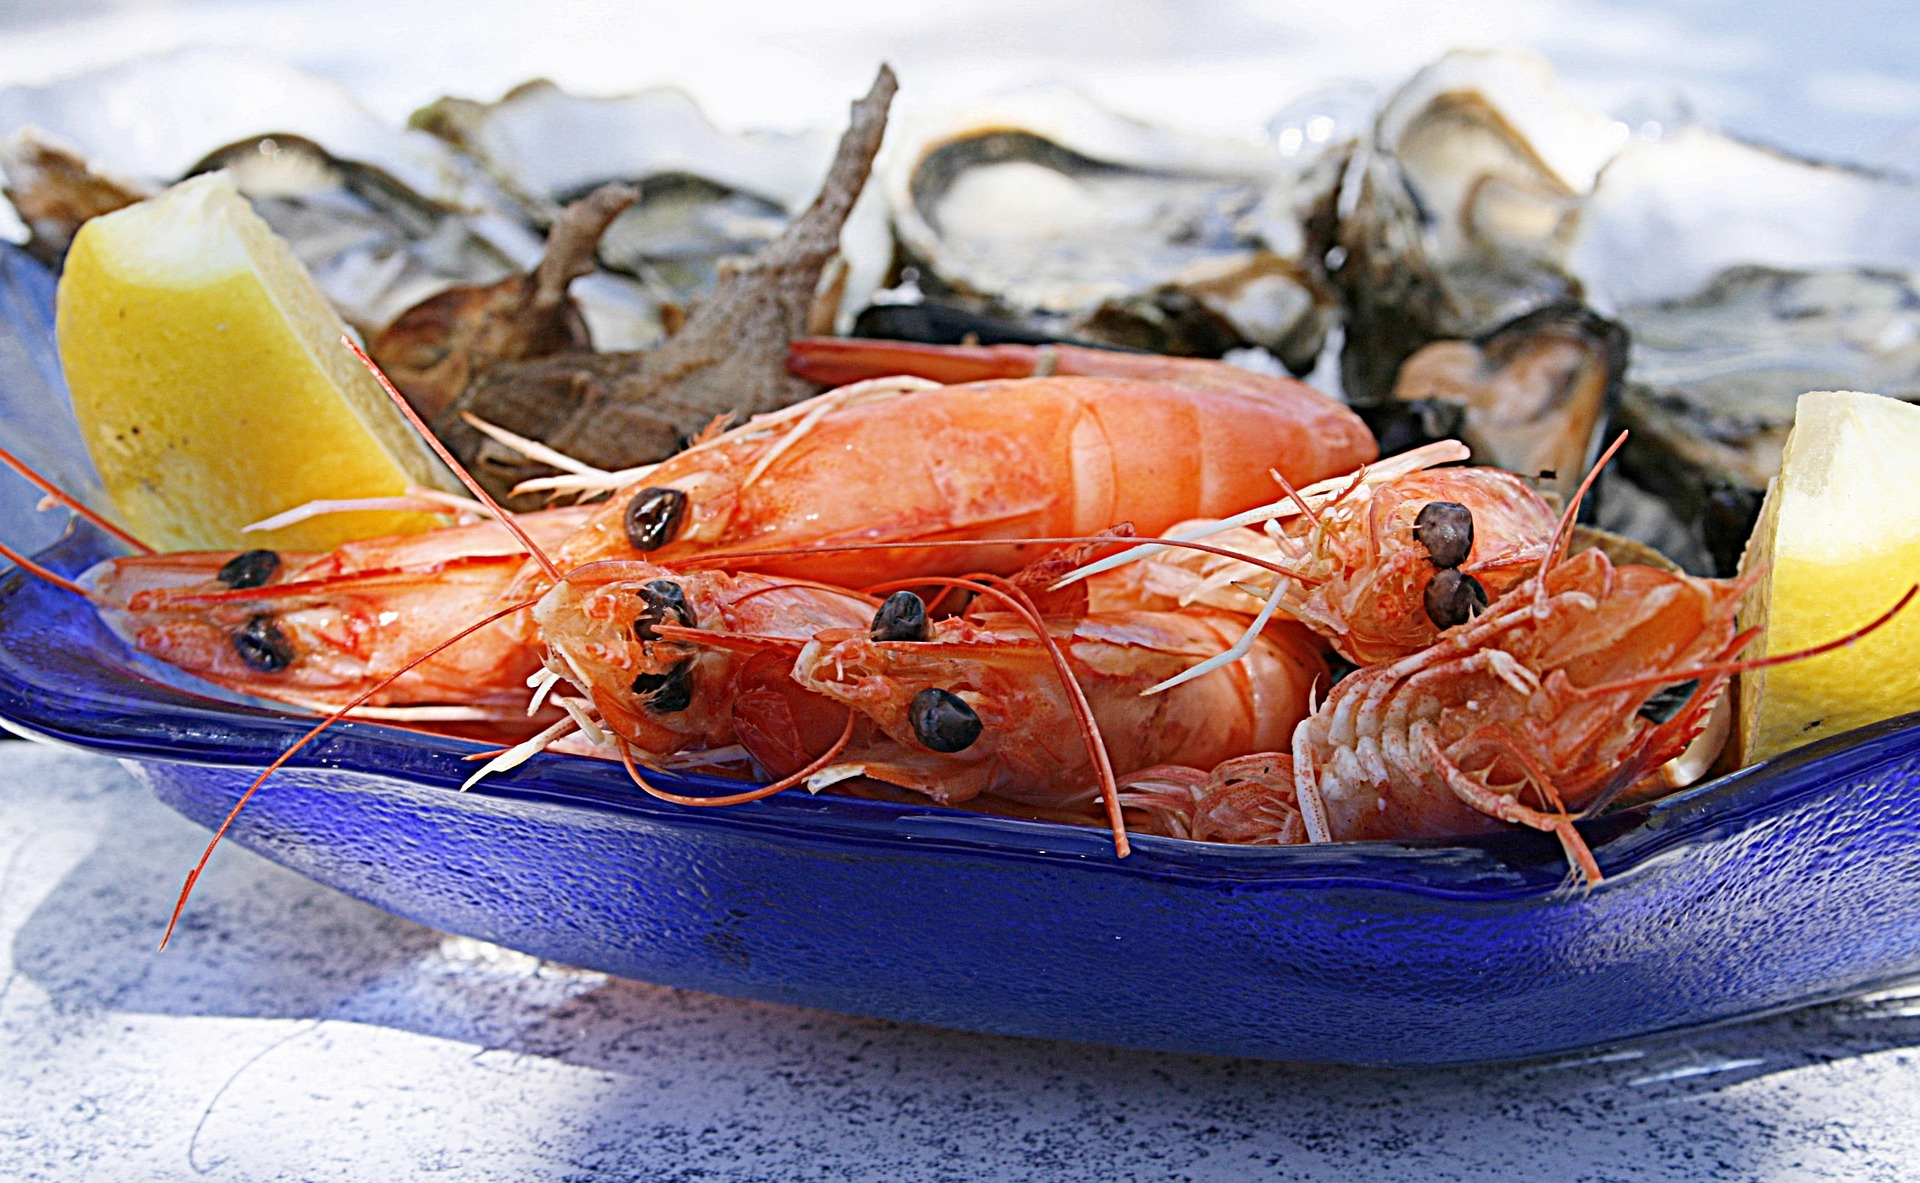 fruits de mer restaurant saint Trojan les bains